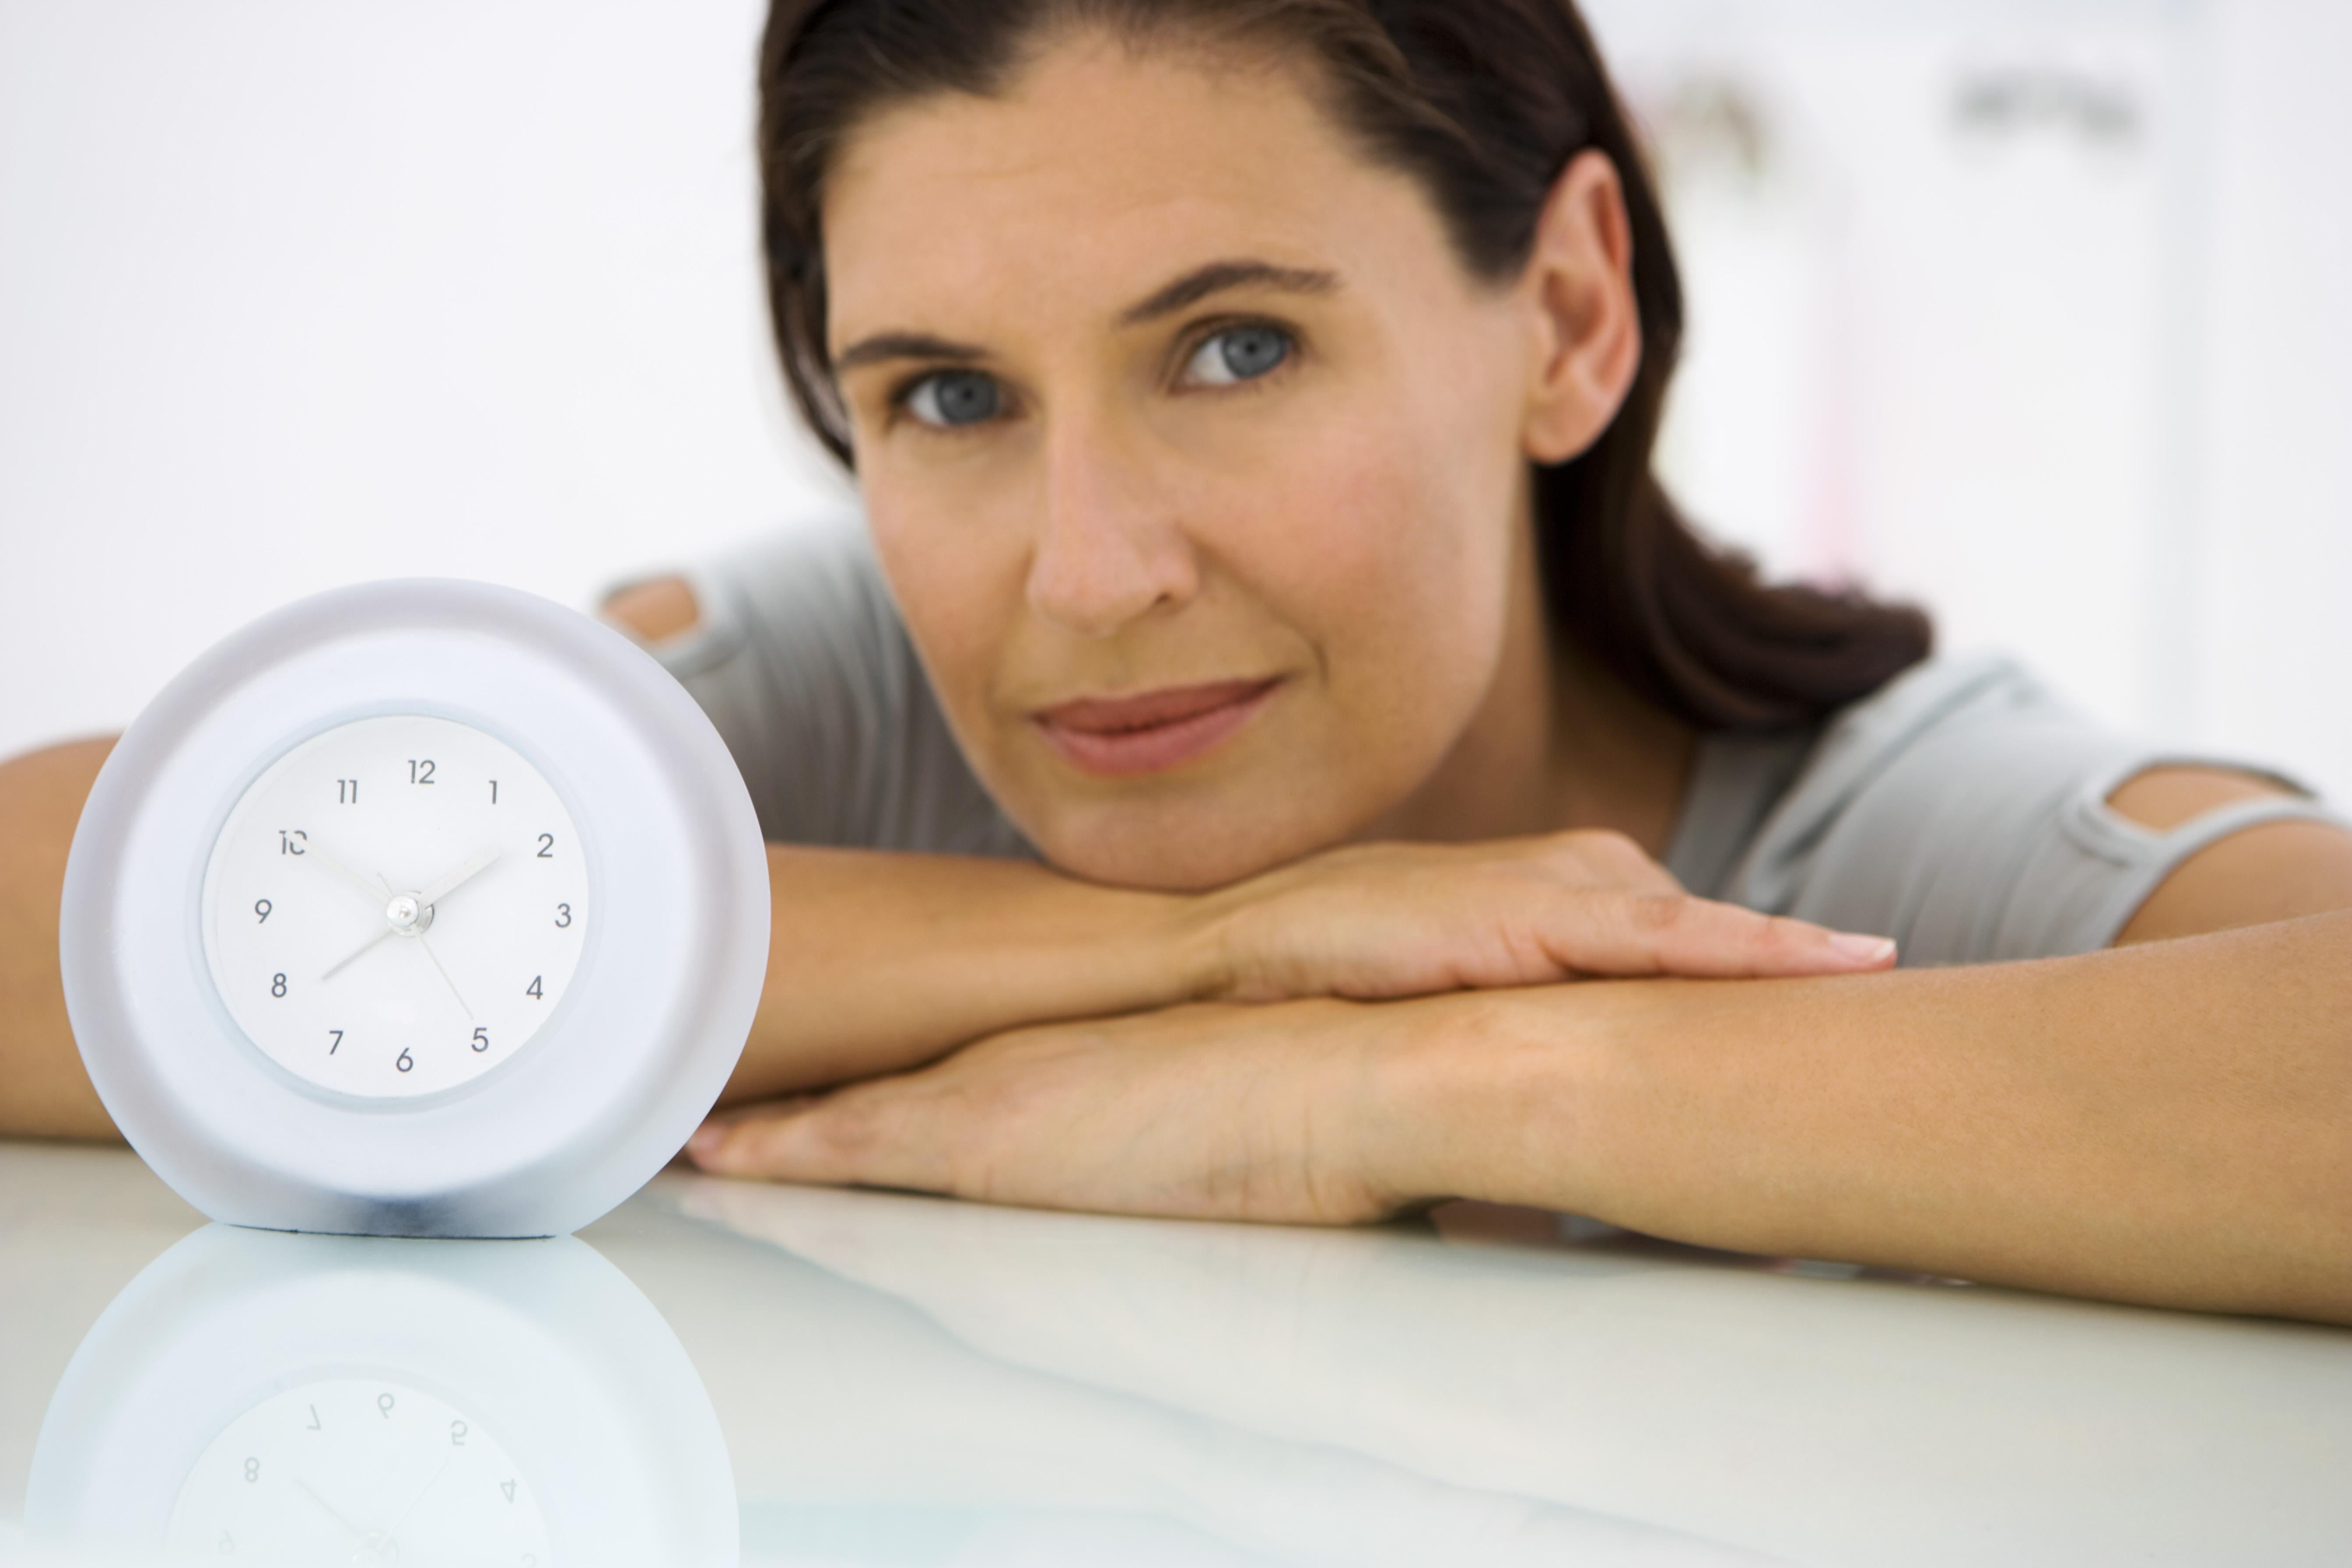 hautpflege unsere anti aging tipps kosmetik transparent. Black Bedroom Furniture Sets. Home Design Ideas